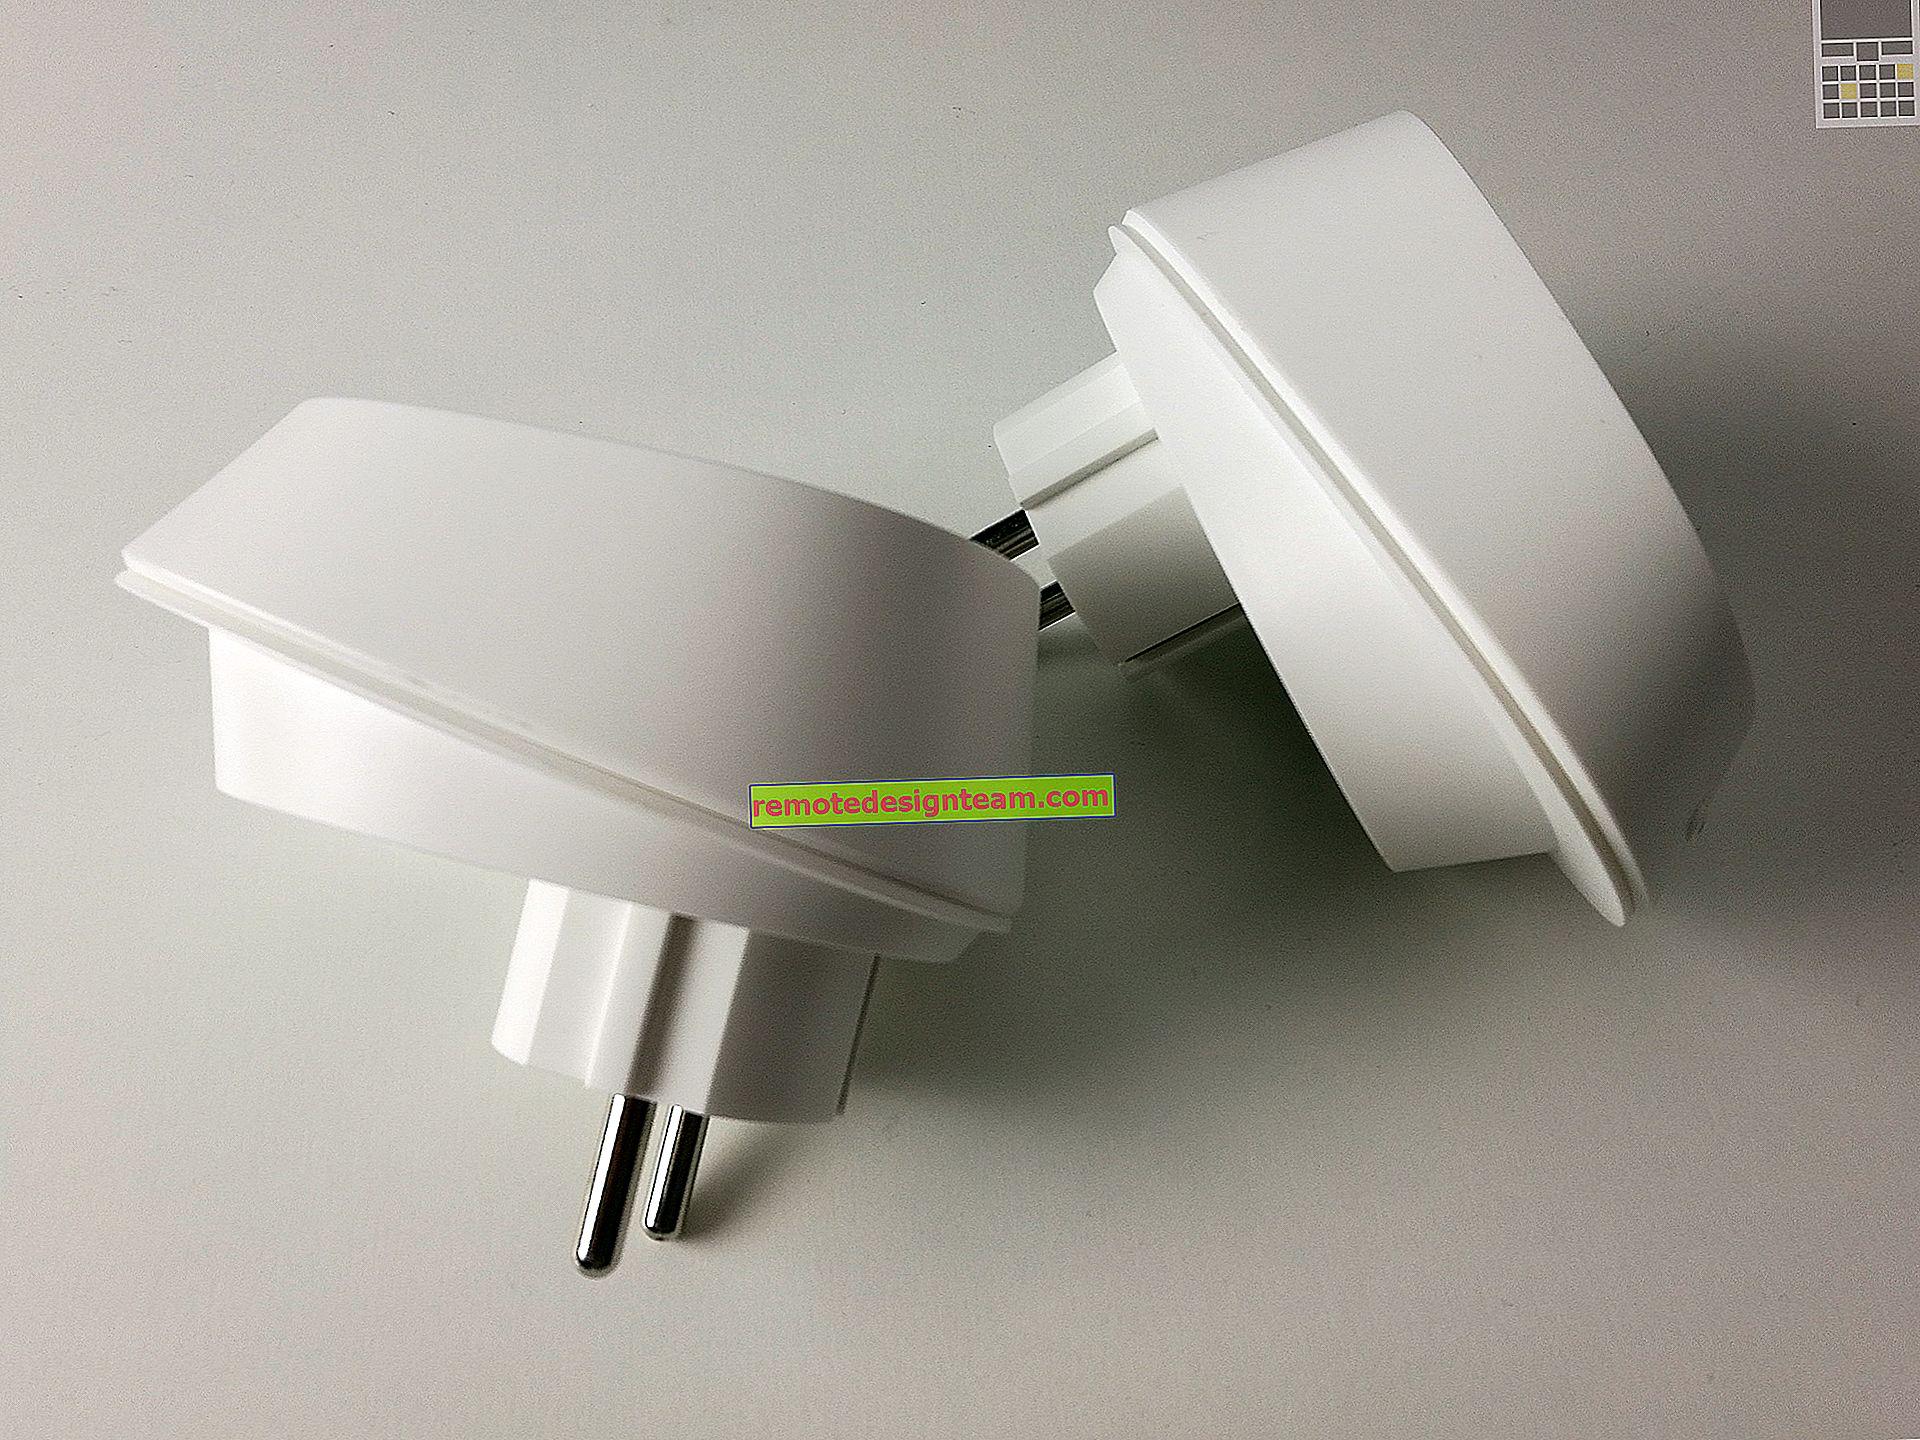 Jimat tenaga dengan palam pintar TP-Link